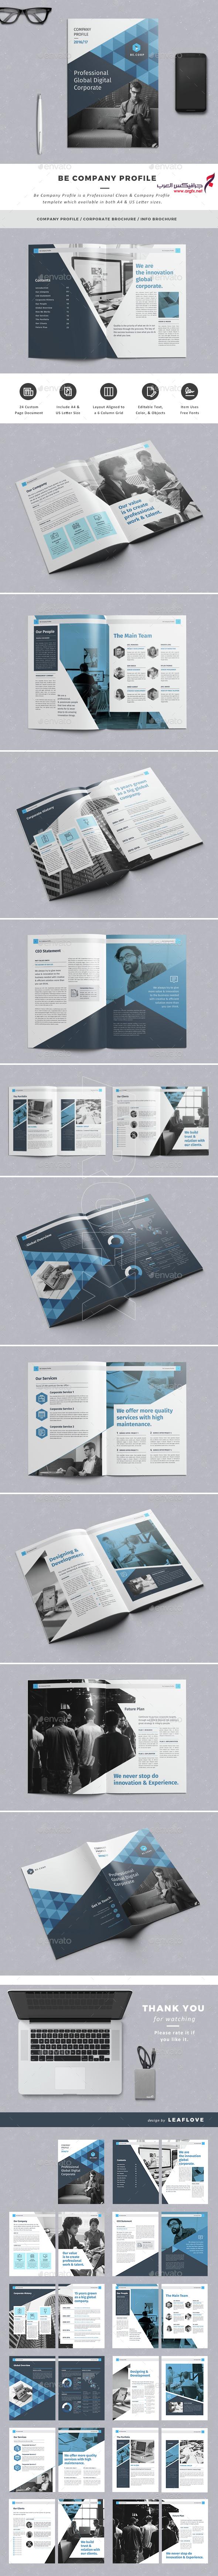 Be Company Profile 15390810